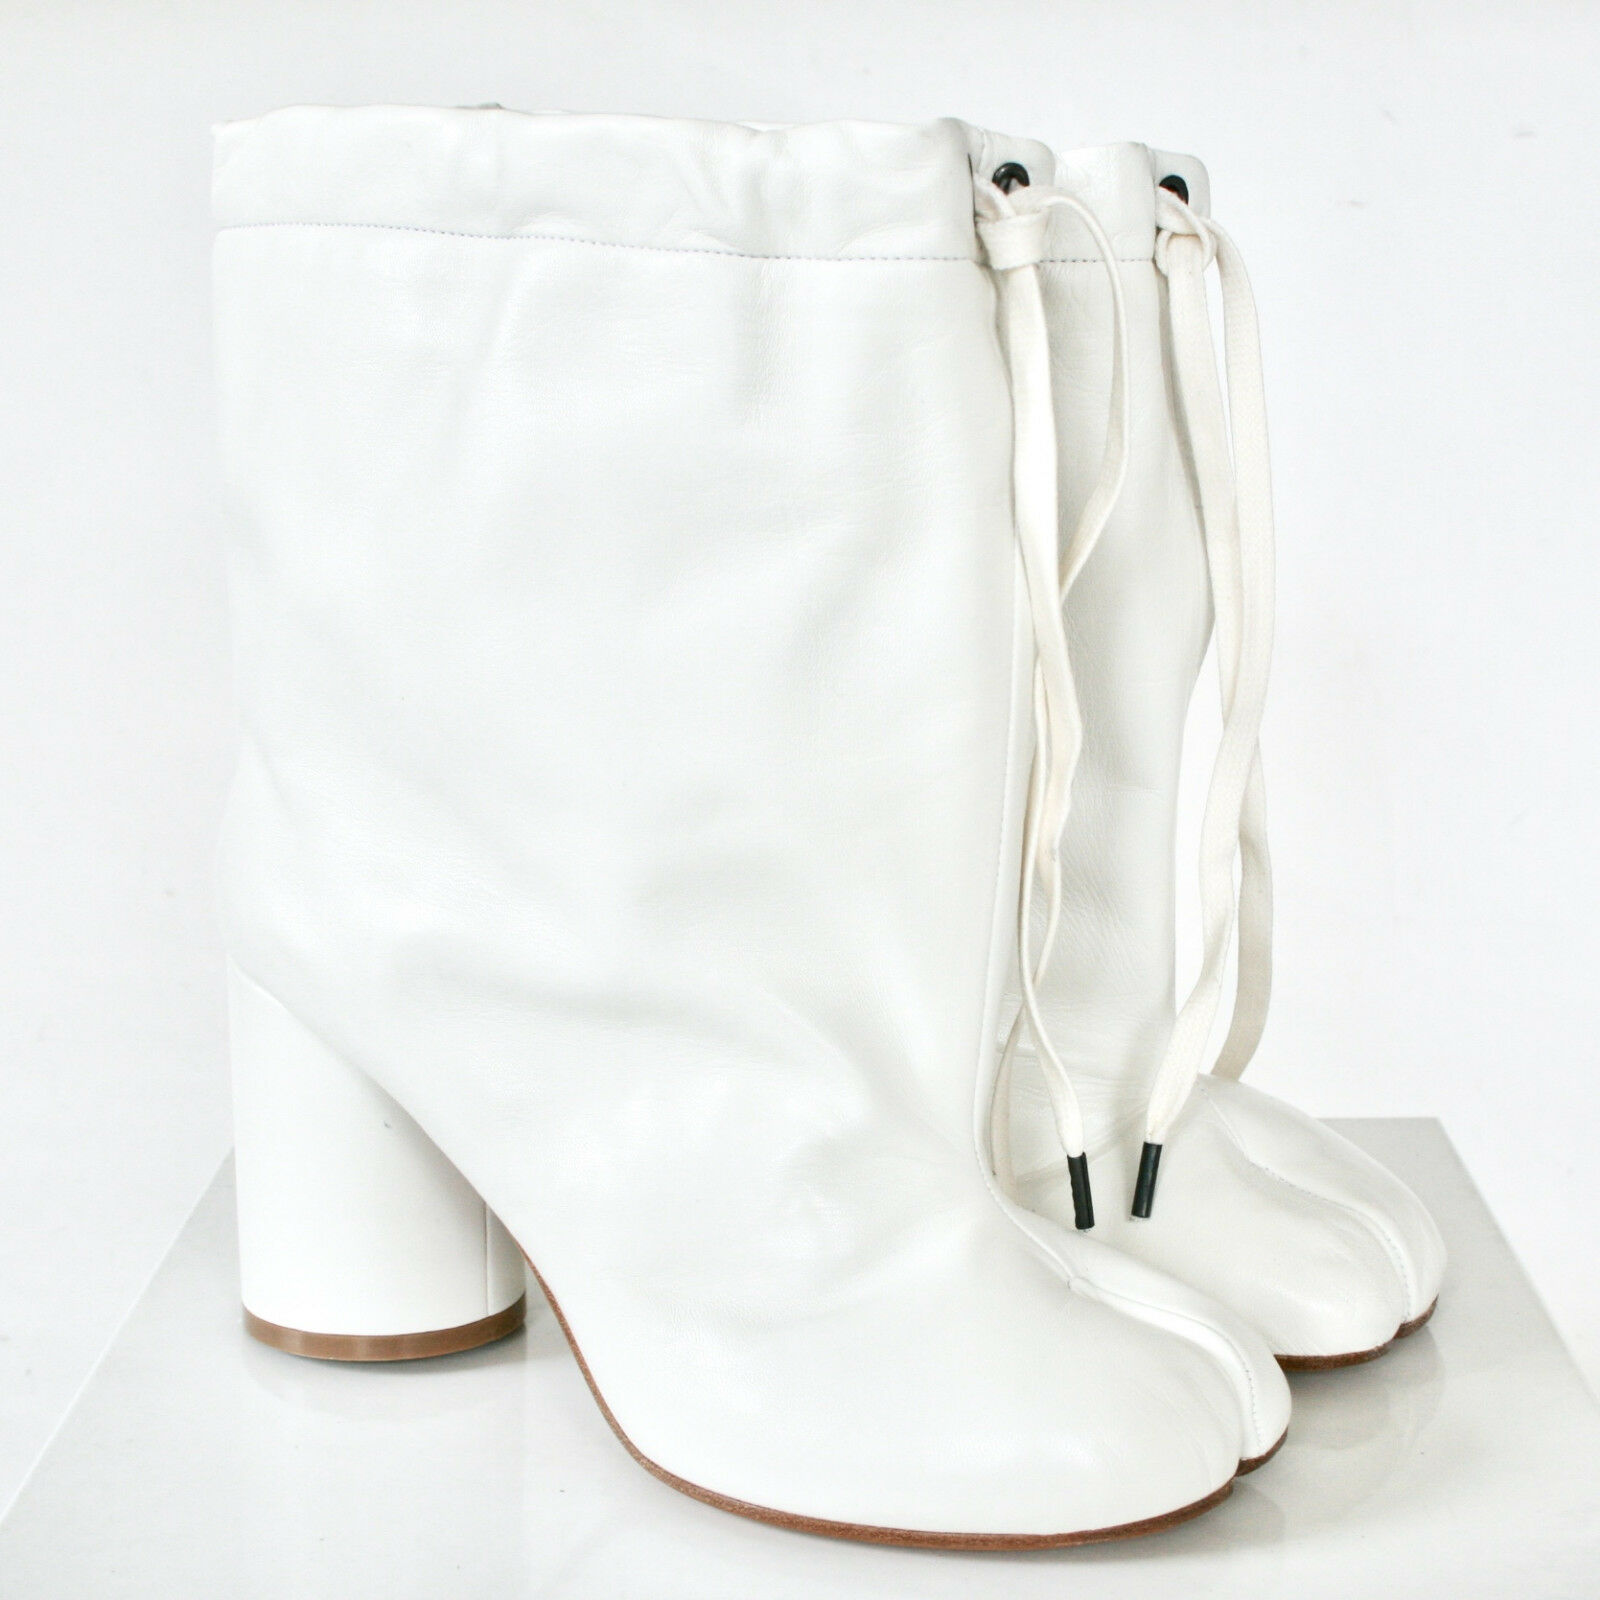 outlet online economico MAISON MARTIN MARGIELA MARGIELA MARGIELA split toe bianca leather avvioies scarpe tabi stivali 38.5 NEW  sconto prezzo basso